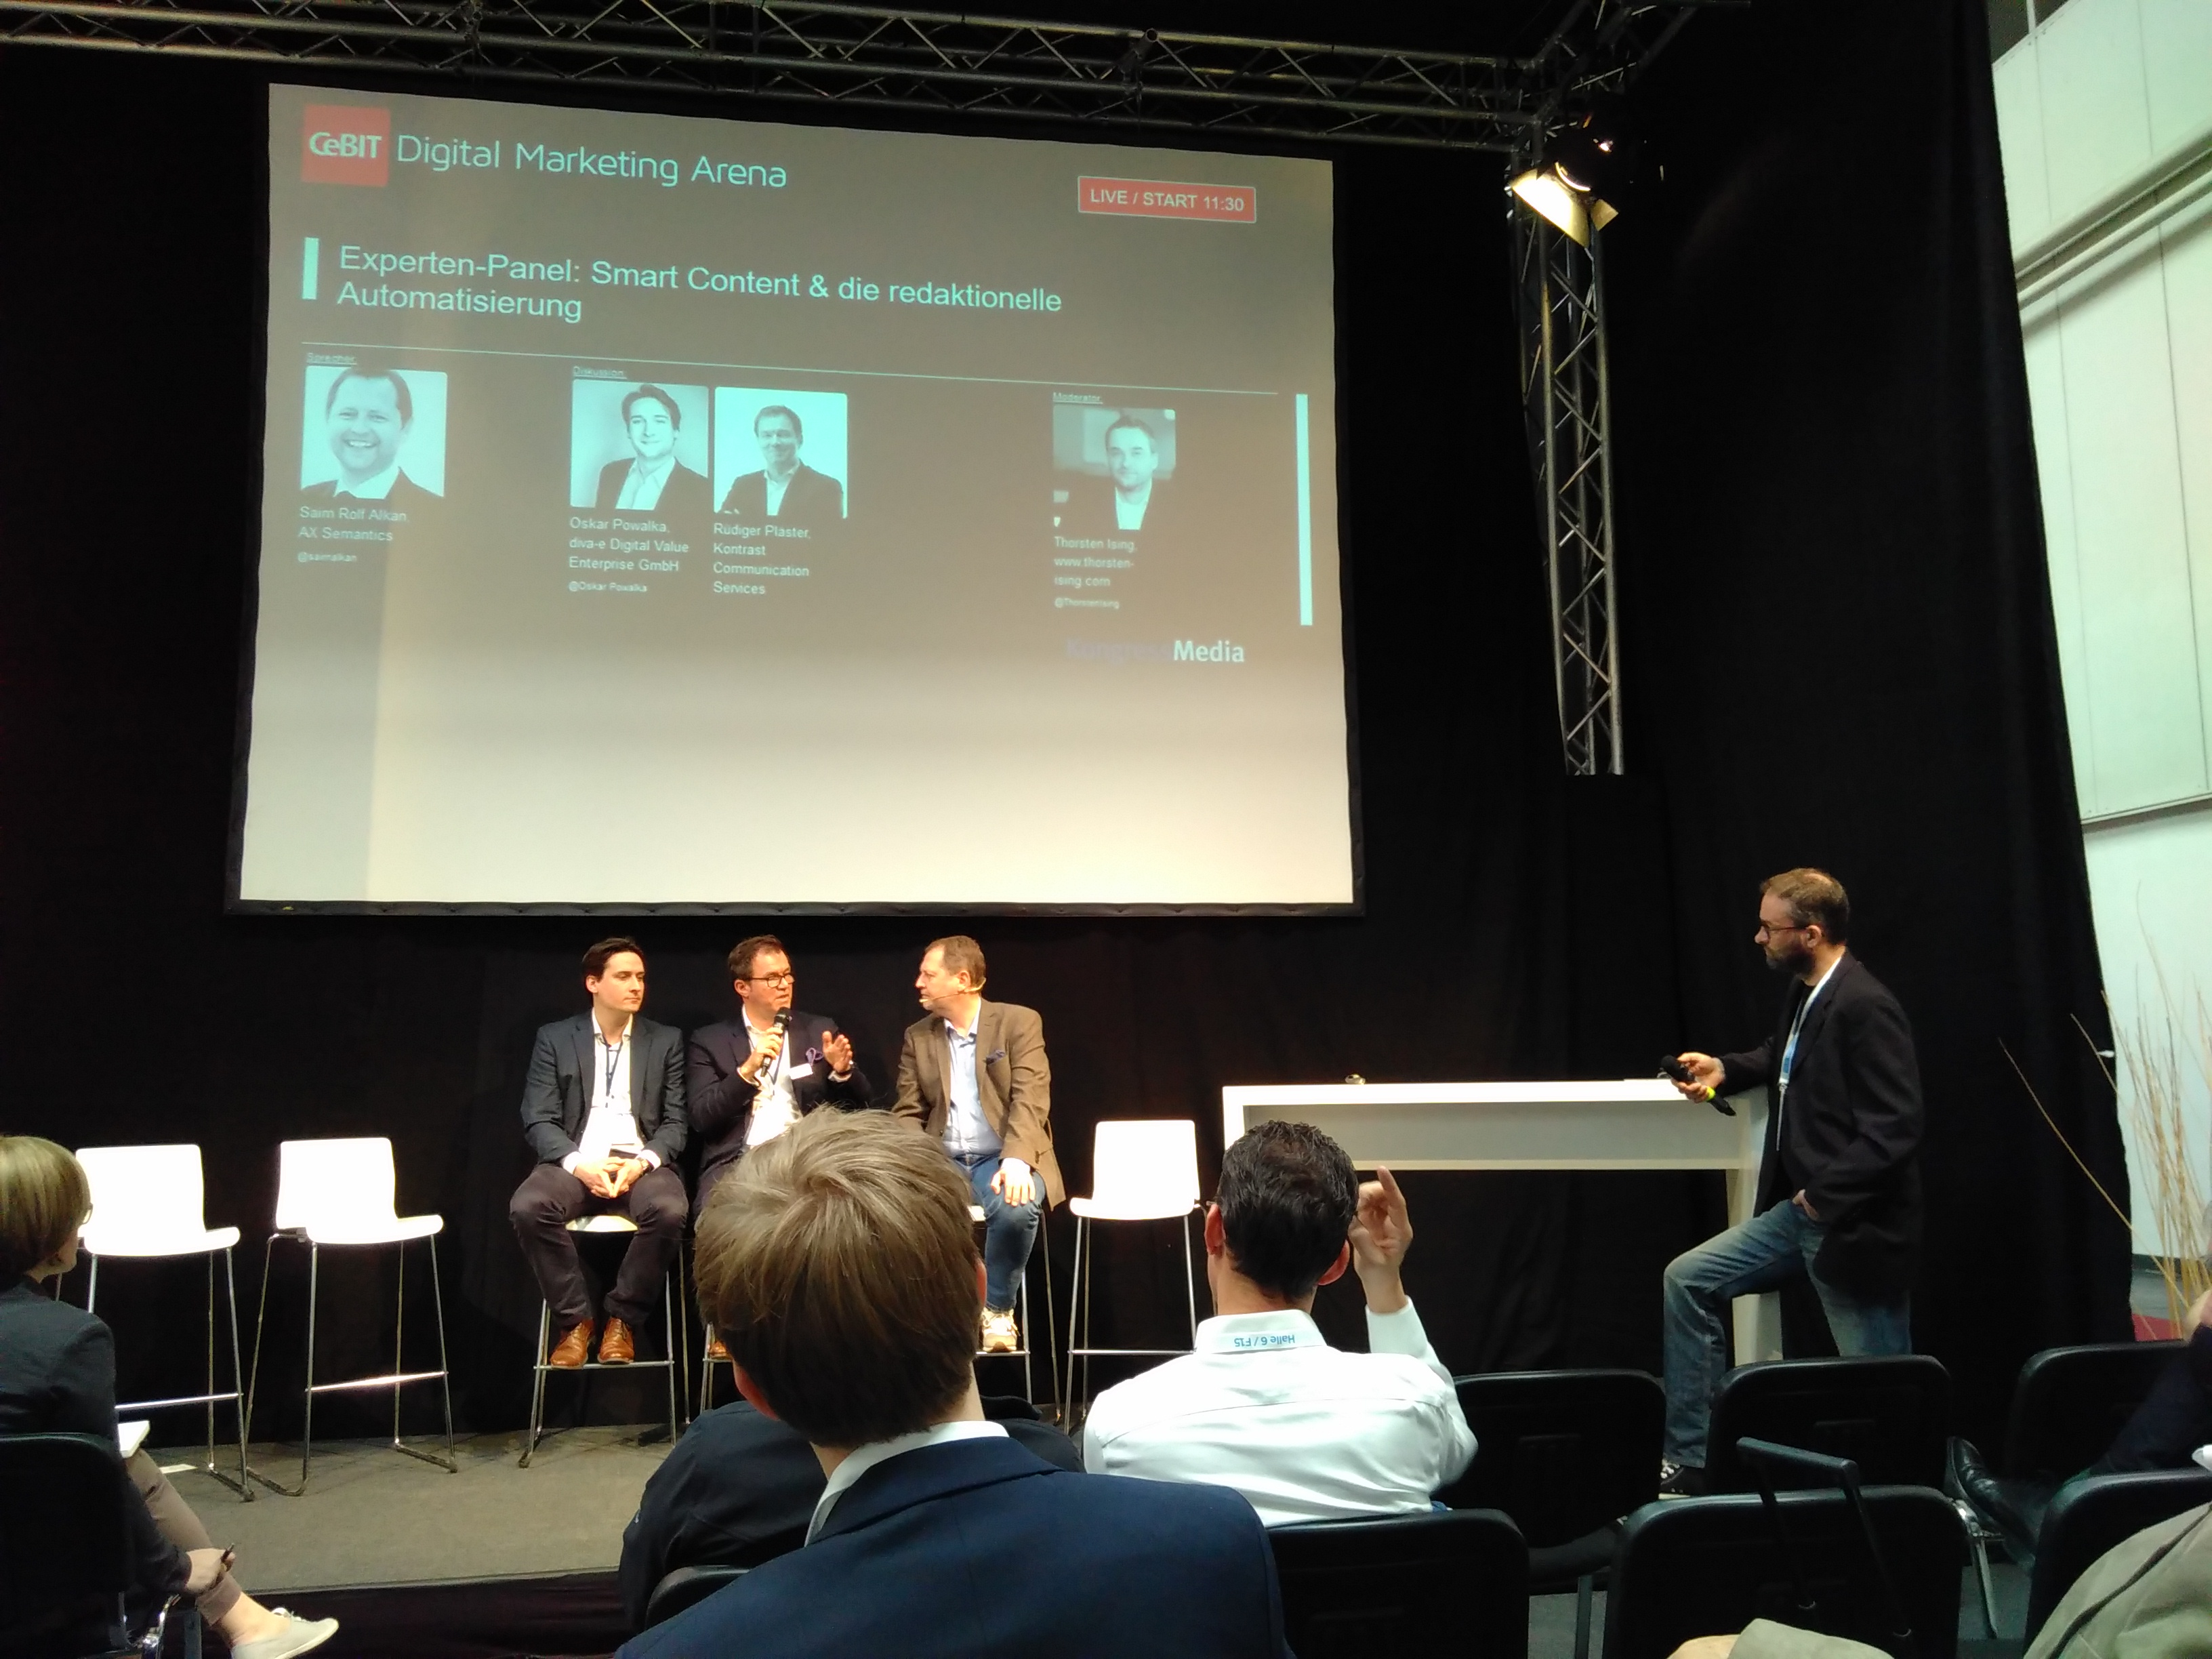 Experten Panel Content Automatisierung